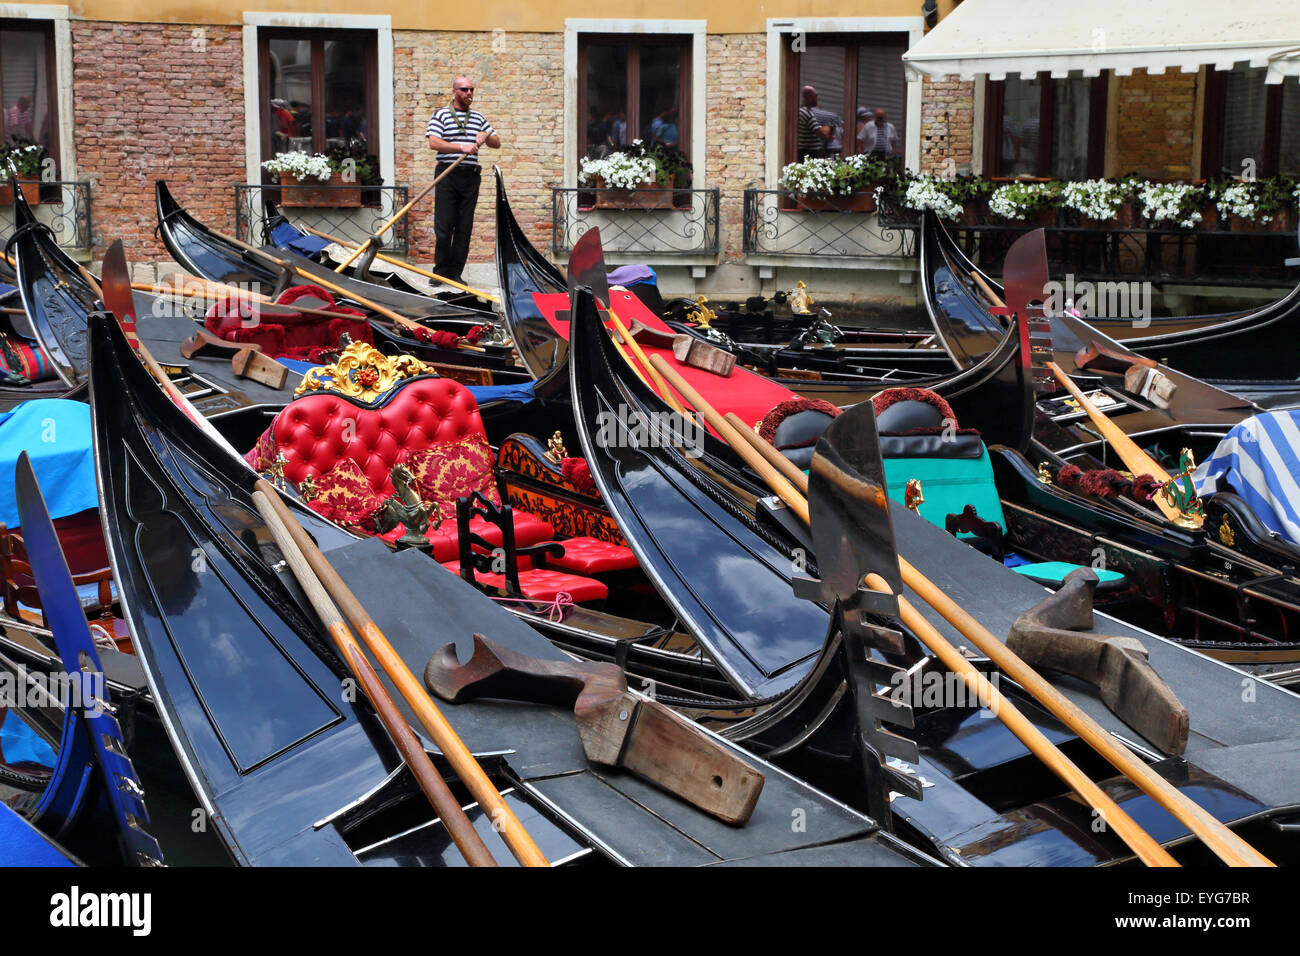 Gondola parking at Servizio Gondole Bacino Orseolo, Venice, Italy - Stock Image